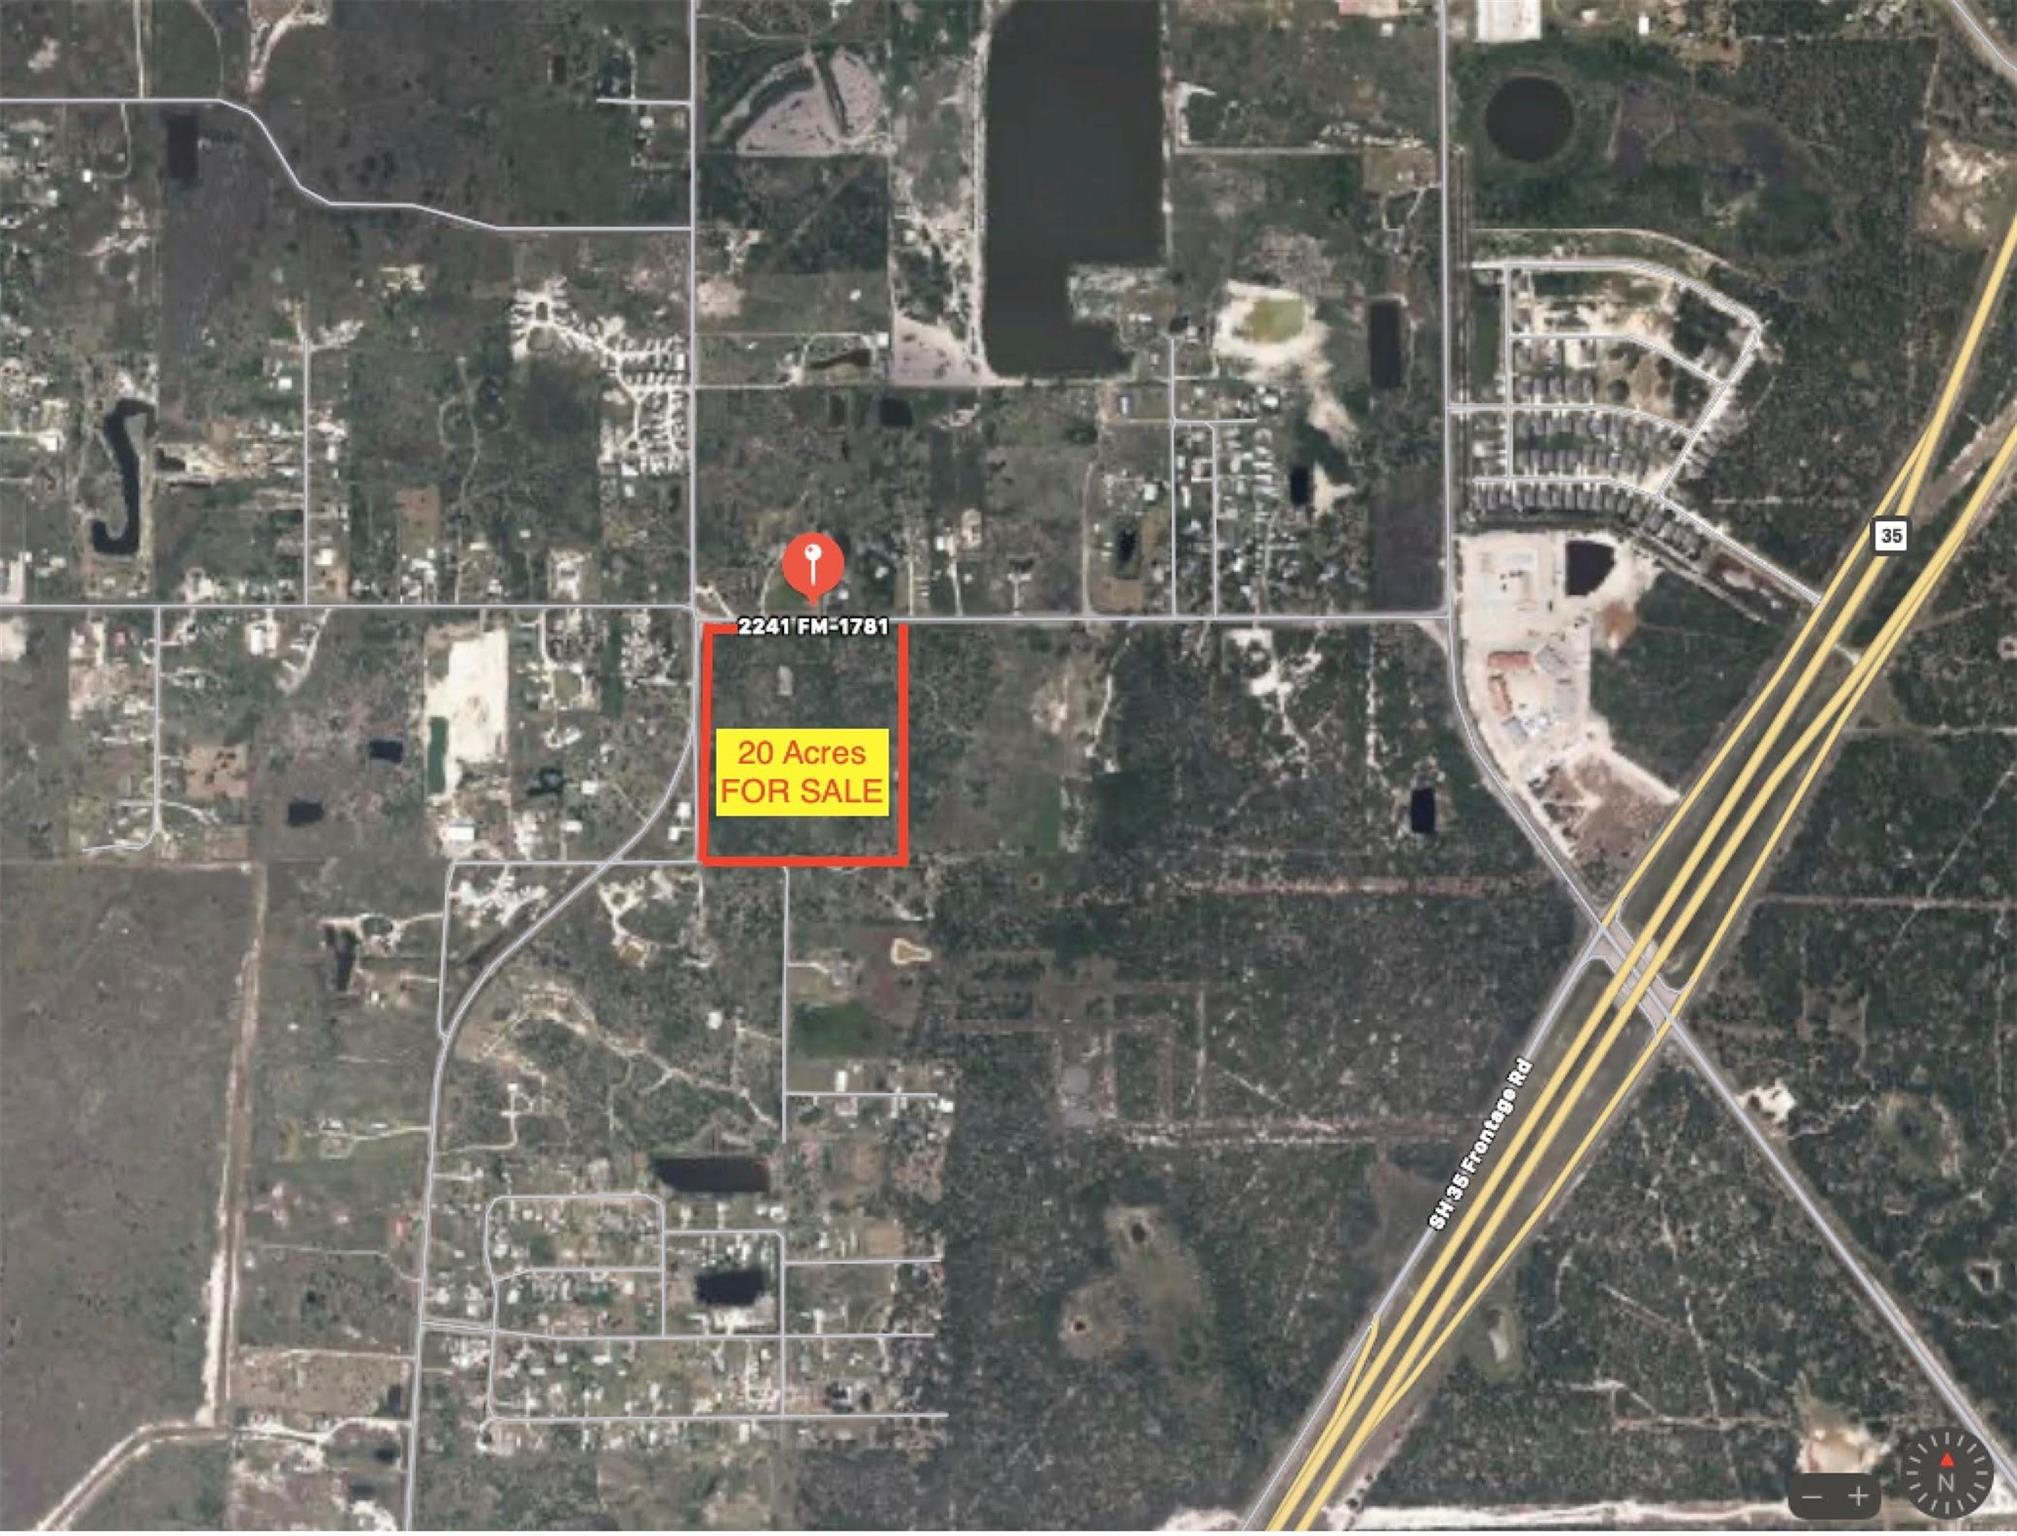 2248 Fm 1781 Property Photo - Rockport, TX real estate listing